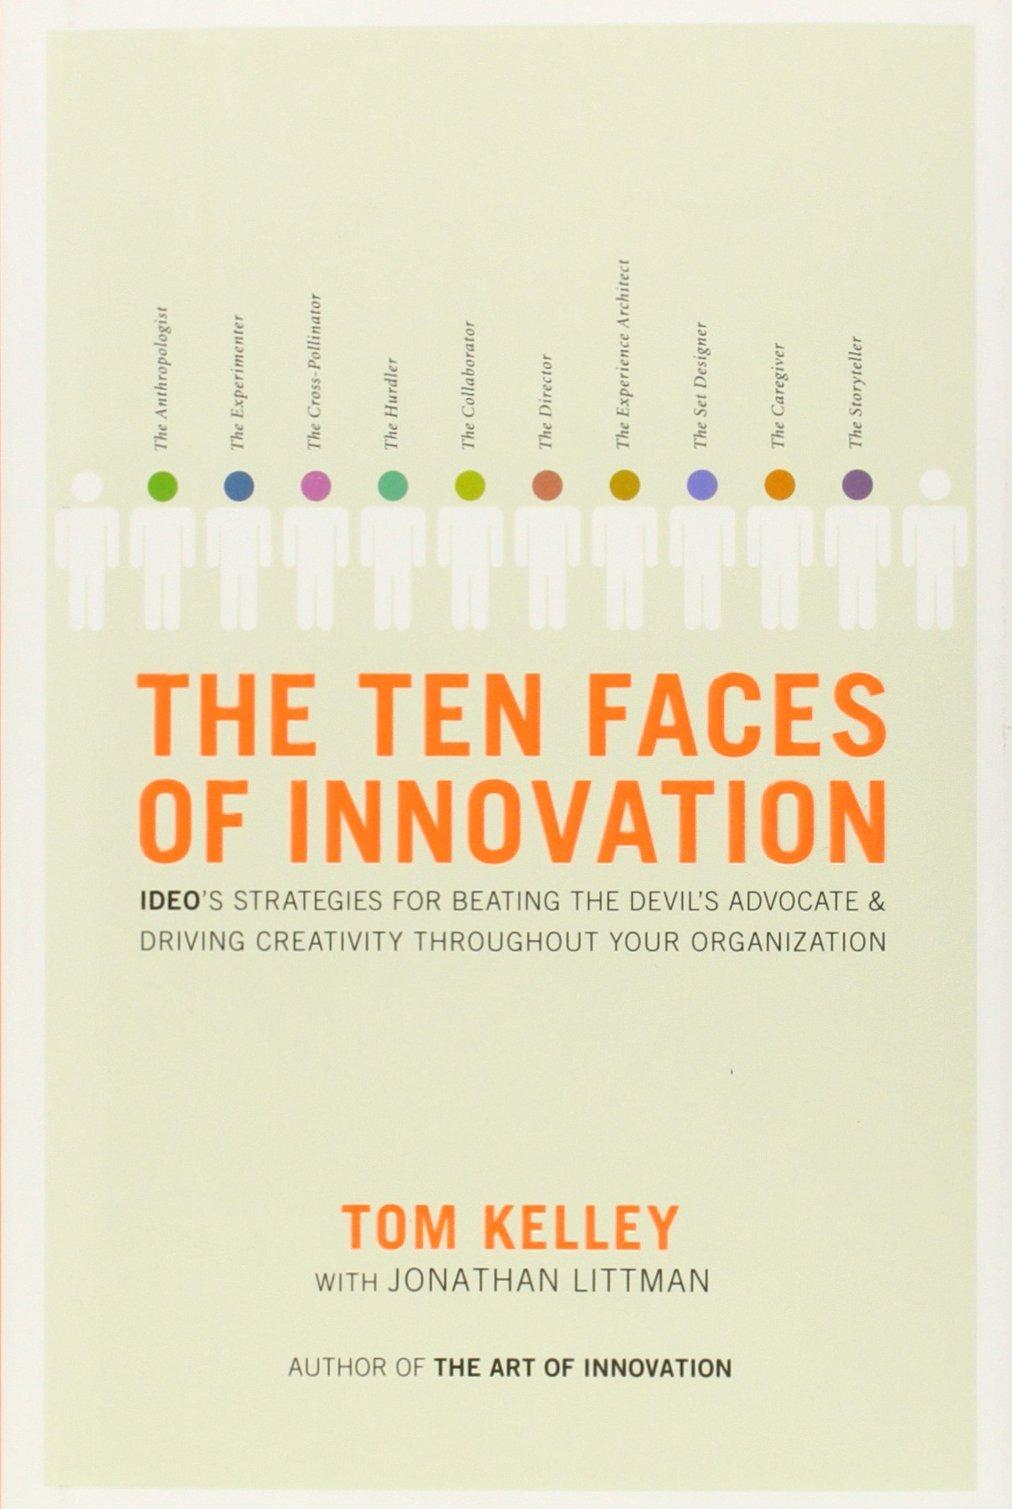 The-Ten-Faces-of-Innovation.jpg